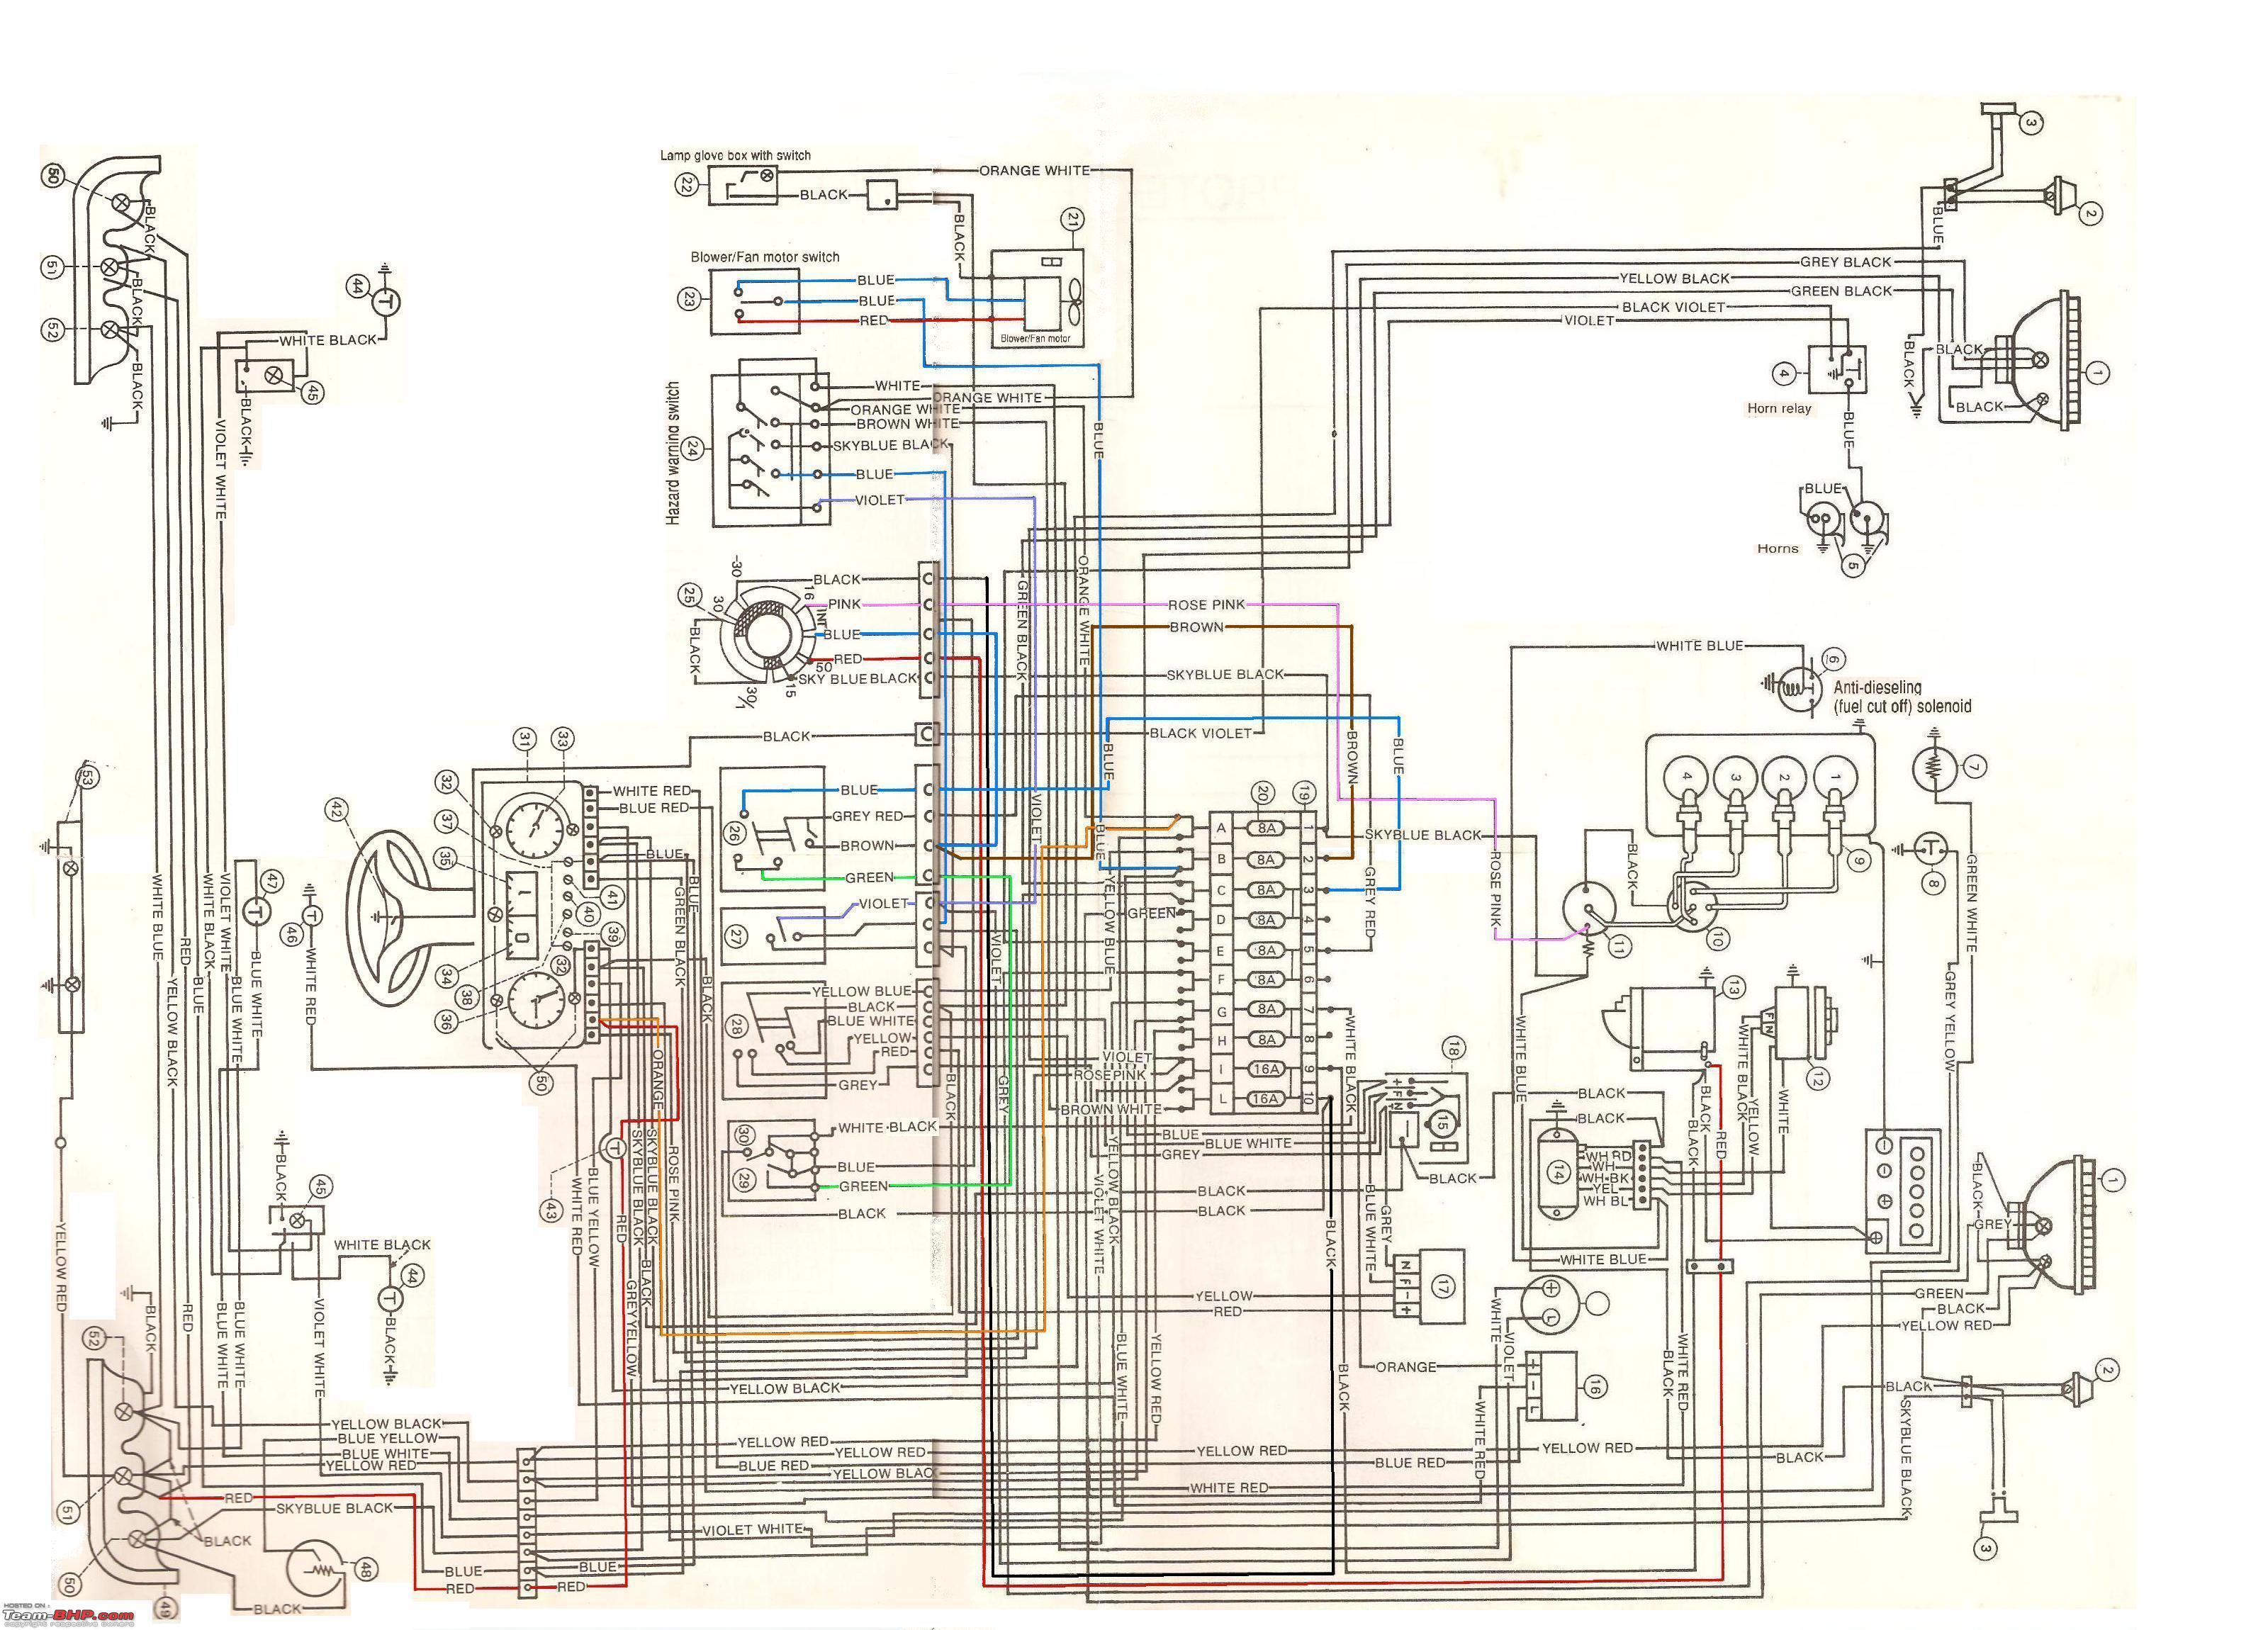 maruti car manuals wiring diagrams pdf amp fault codes suzuki alto electrical wiring diagram [ 3200 x 2300 Pixel ]